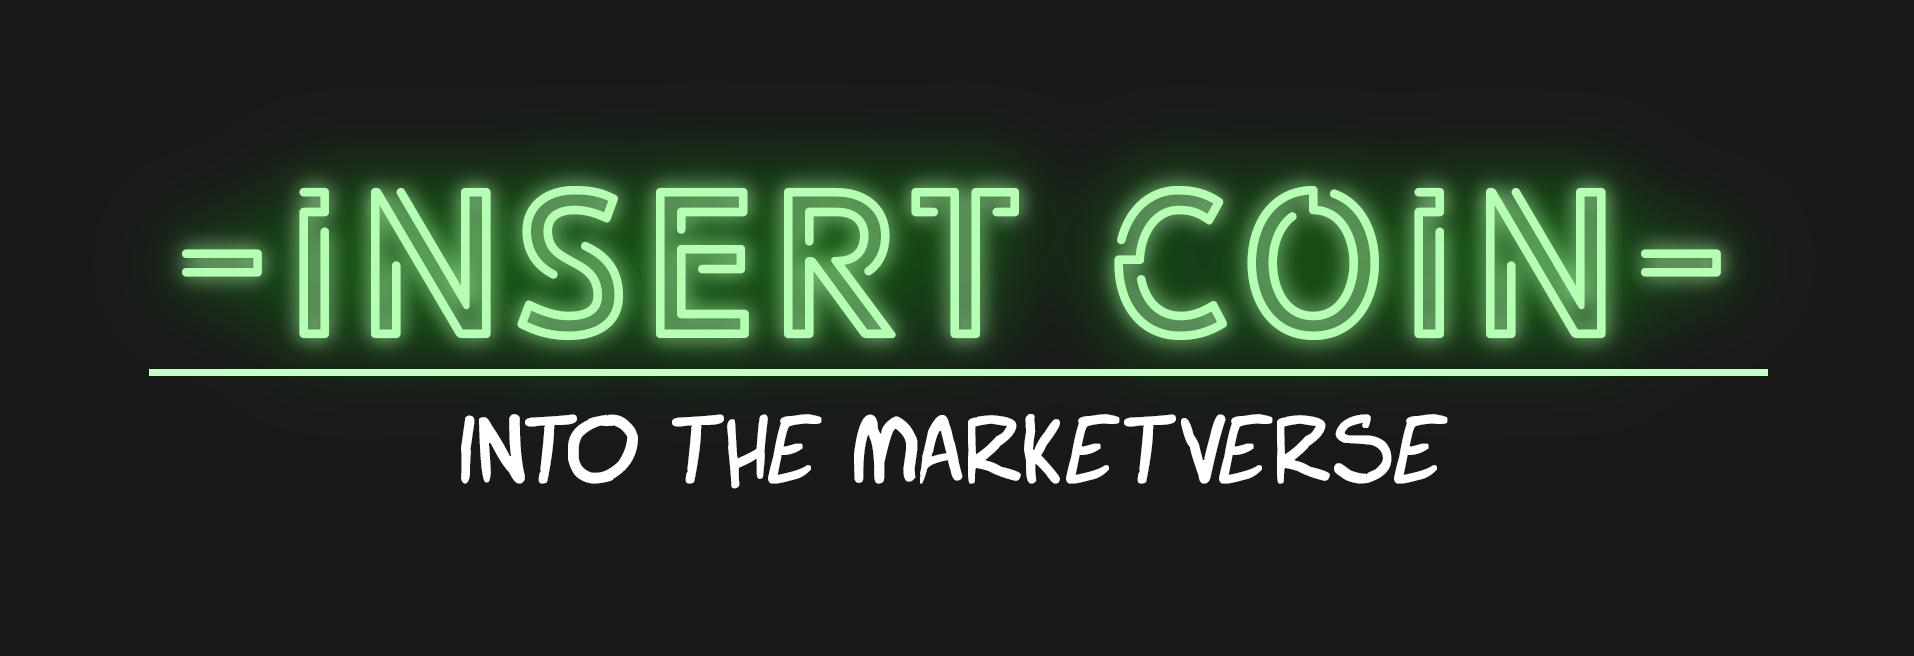 - insert coin - Into the Marketverse